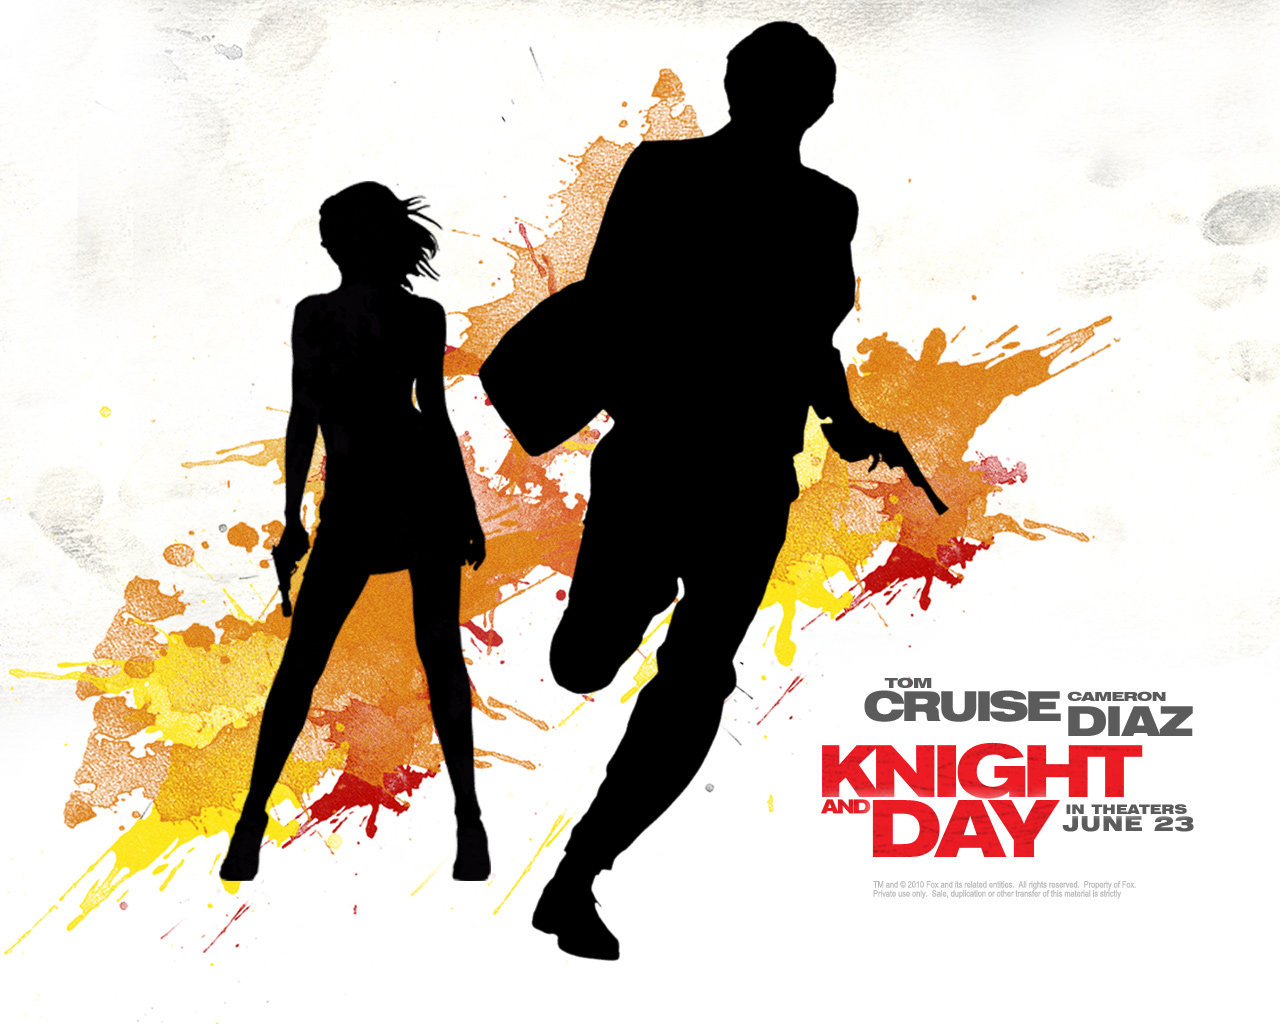 http://2.bp.blogspot.com/-o7M_eo0q0vs/TZC-p2gX6sI/AAAAAAAAAEY/LqOEKu2QzO8/s1600/knight_day02.jpg